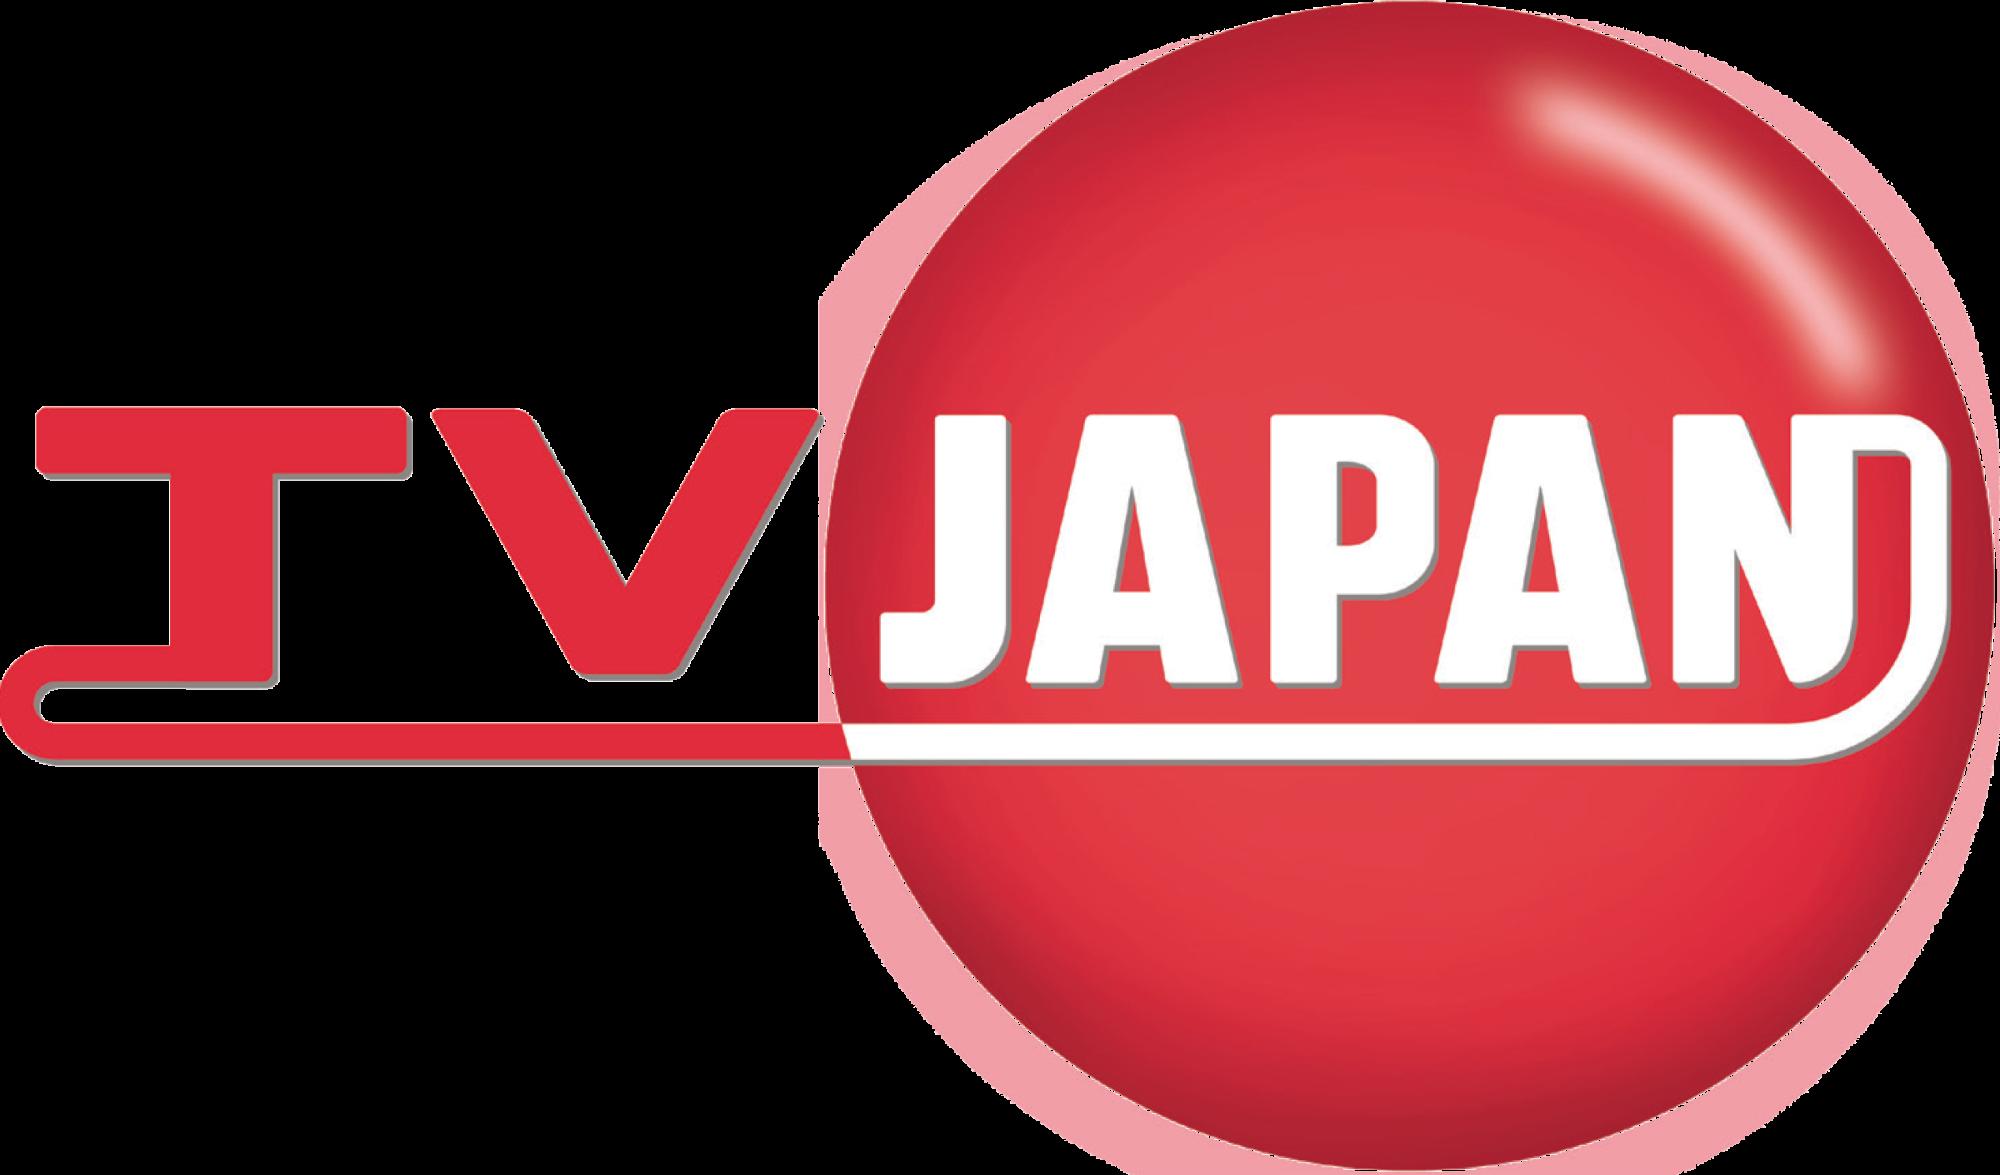 TVJapan